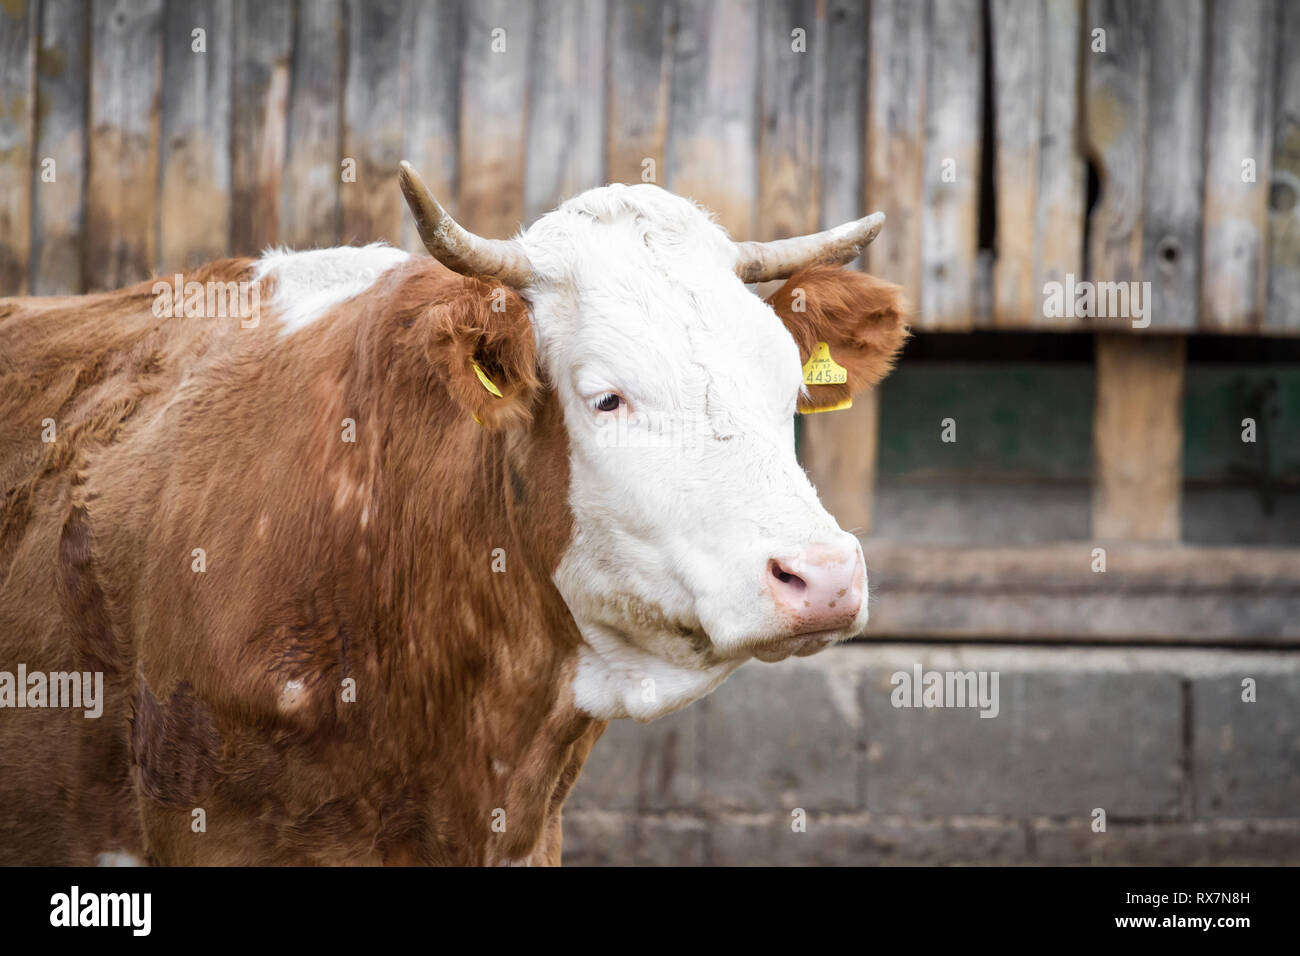 Free range cattle in suckler cow husbandry - Stock Image